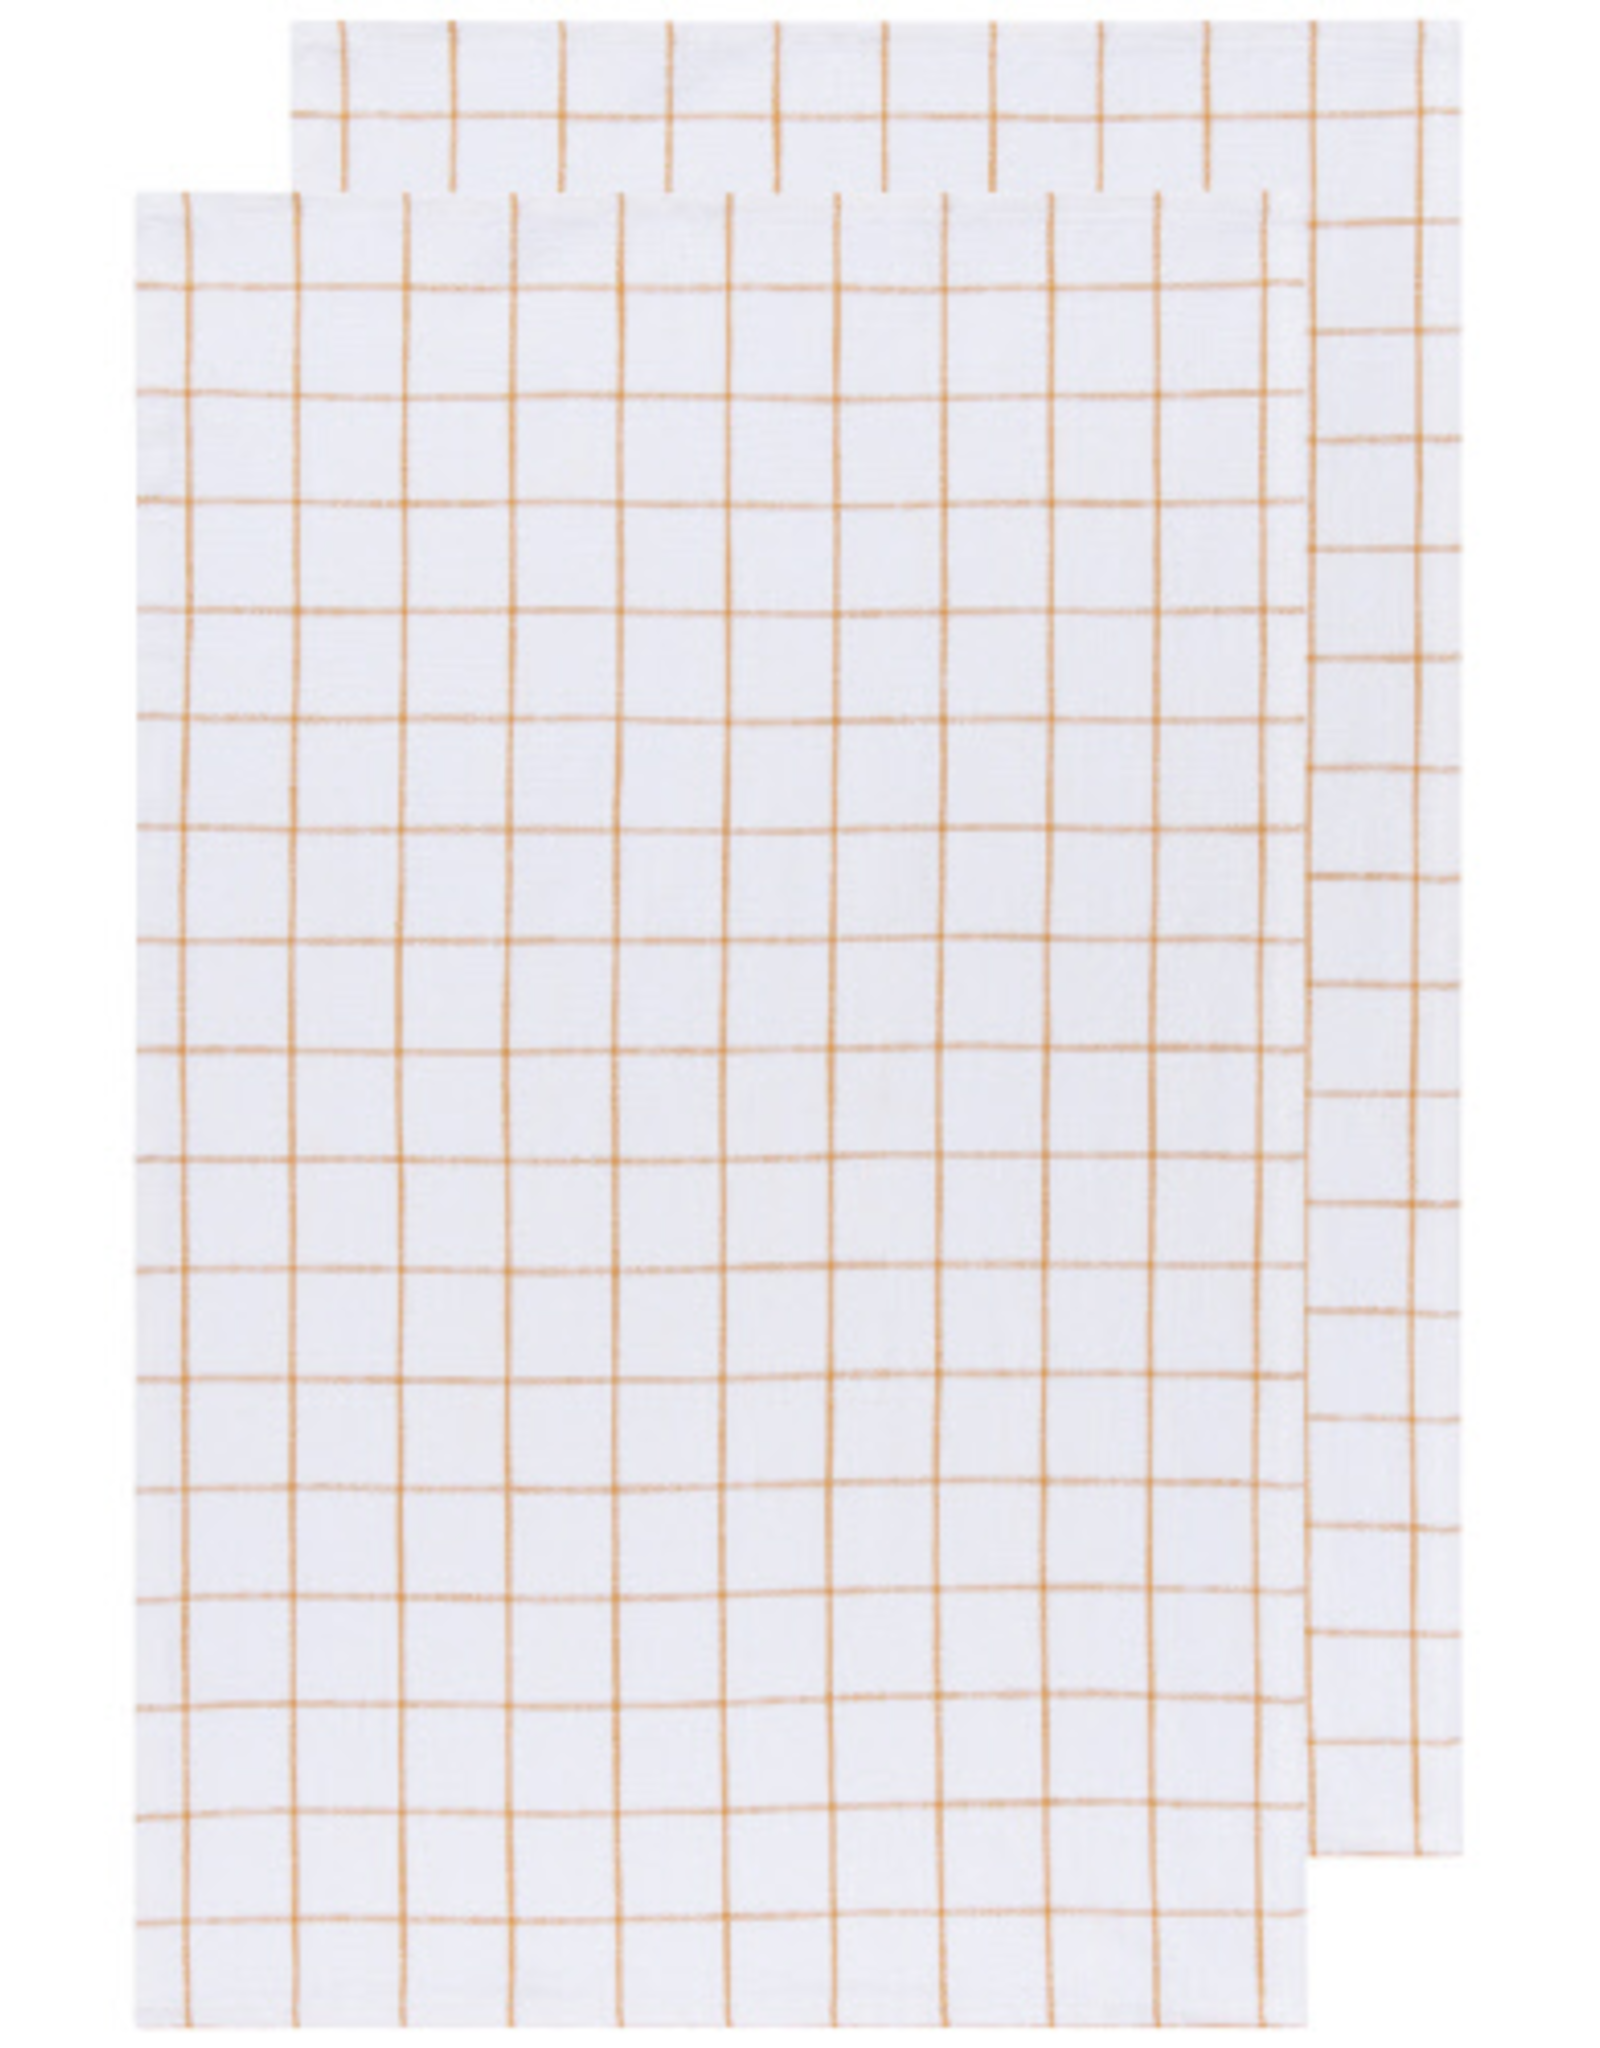 Danica Danica Heirloom Tea Towel-Ochre Set 2